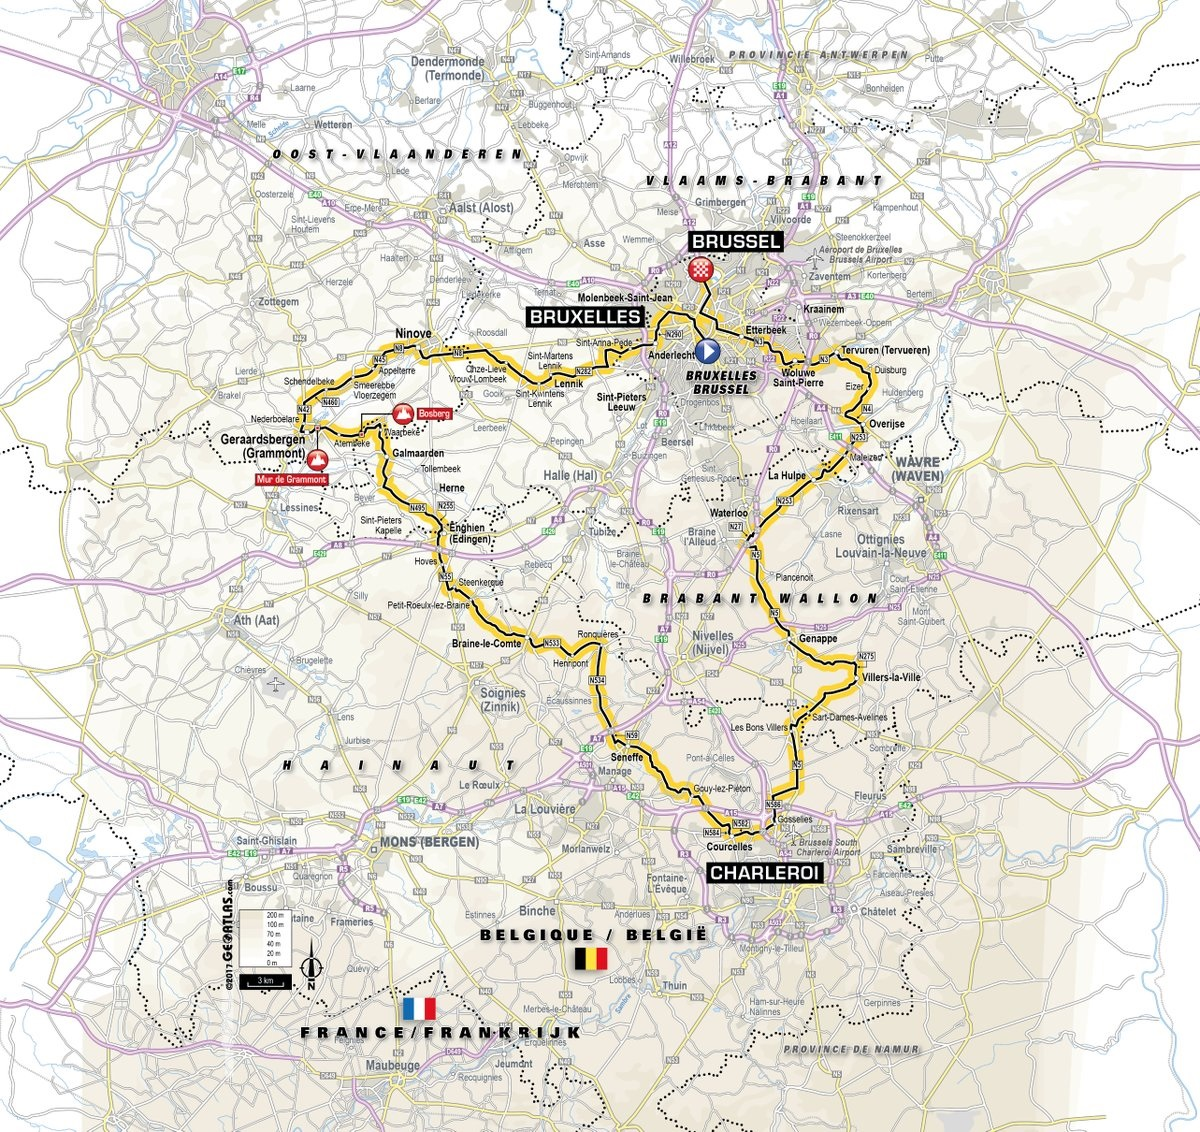 Präsentation des Grand Départ der Tour de France 2019: Die Streckenkarte der 1. Etappe